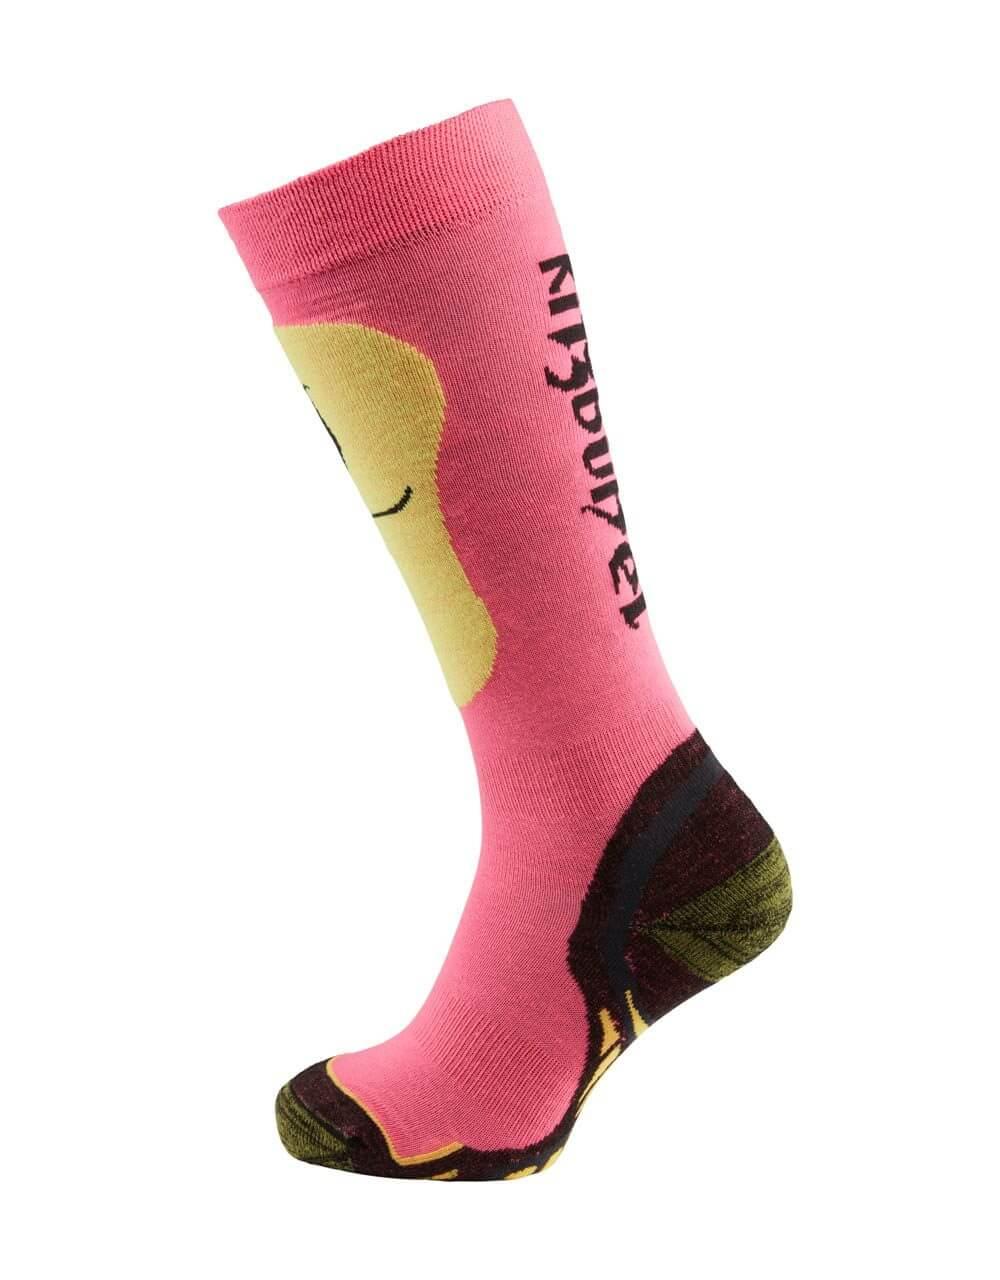 726038232 Skisocken Damen neon pink 2